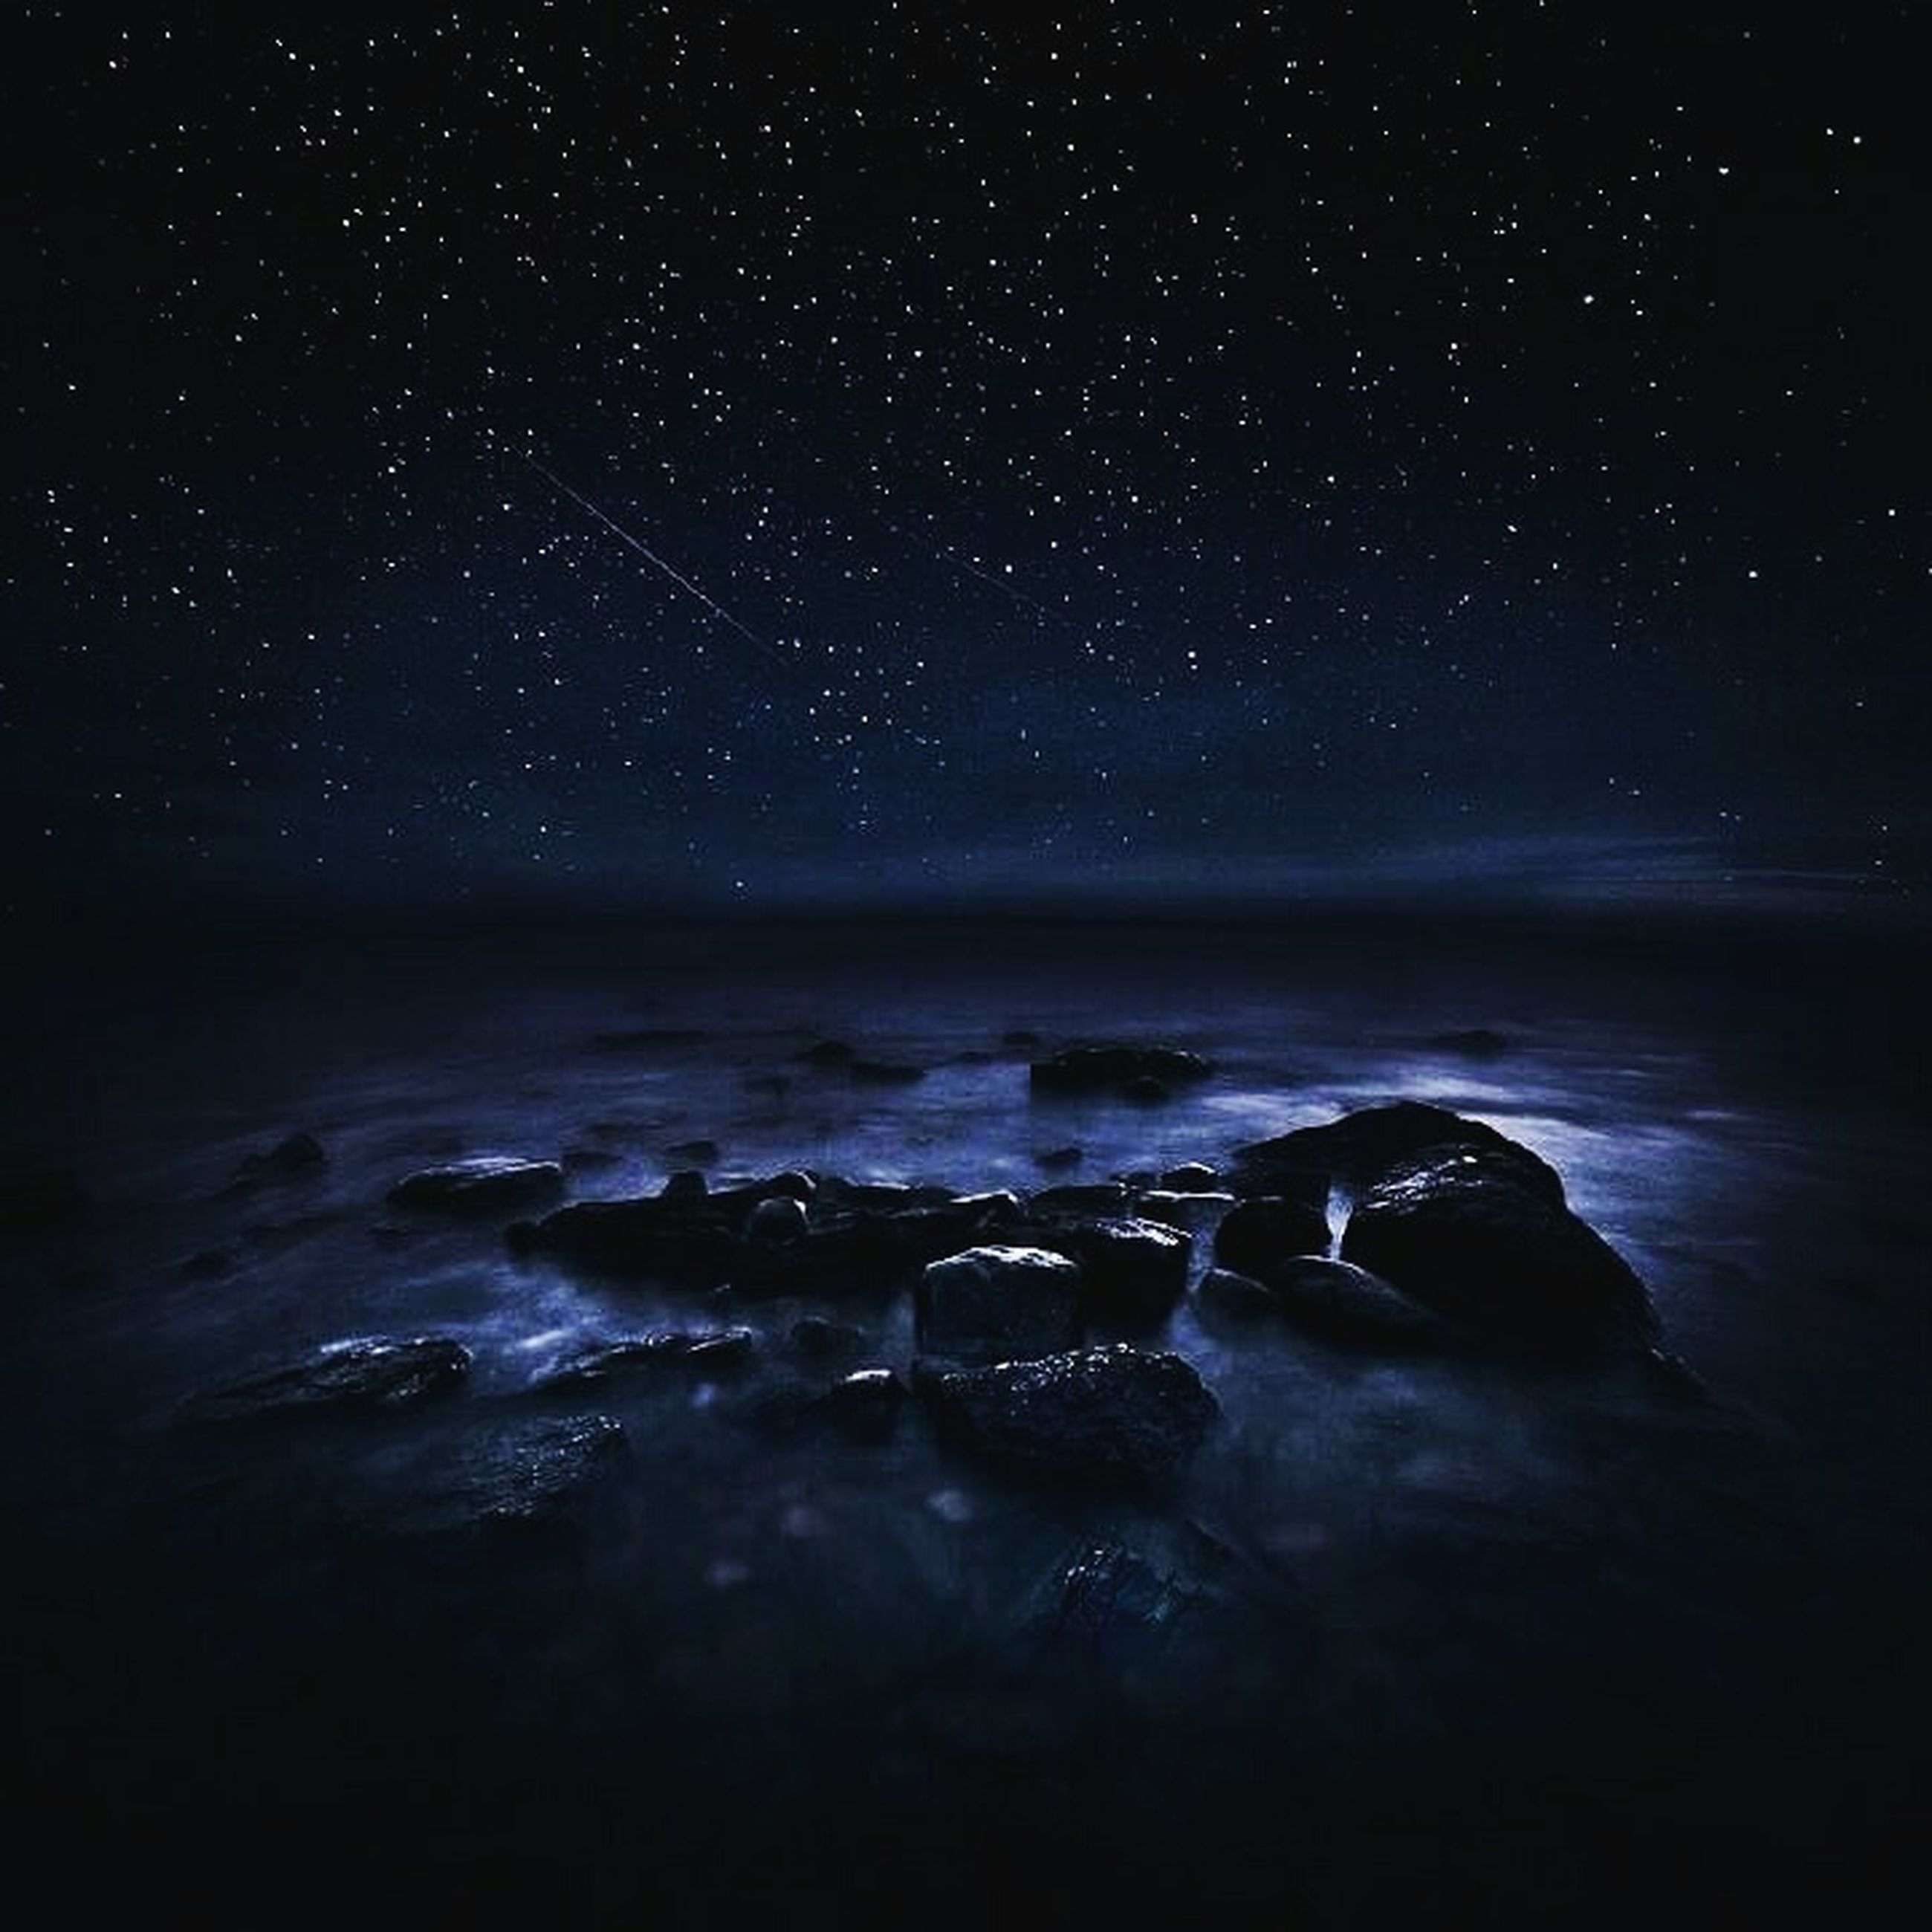 night, star - space, scenics, astronomy, water, beauty in nature, tranquil scene, star field, tranquility, nature, galaxy, star, sea, sky, space, idyllic, milky way, glittering, majestic, dark